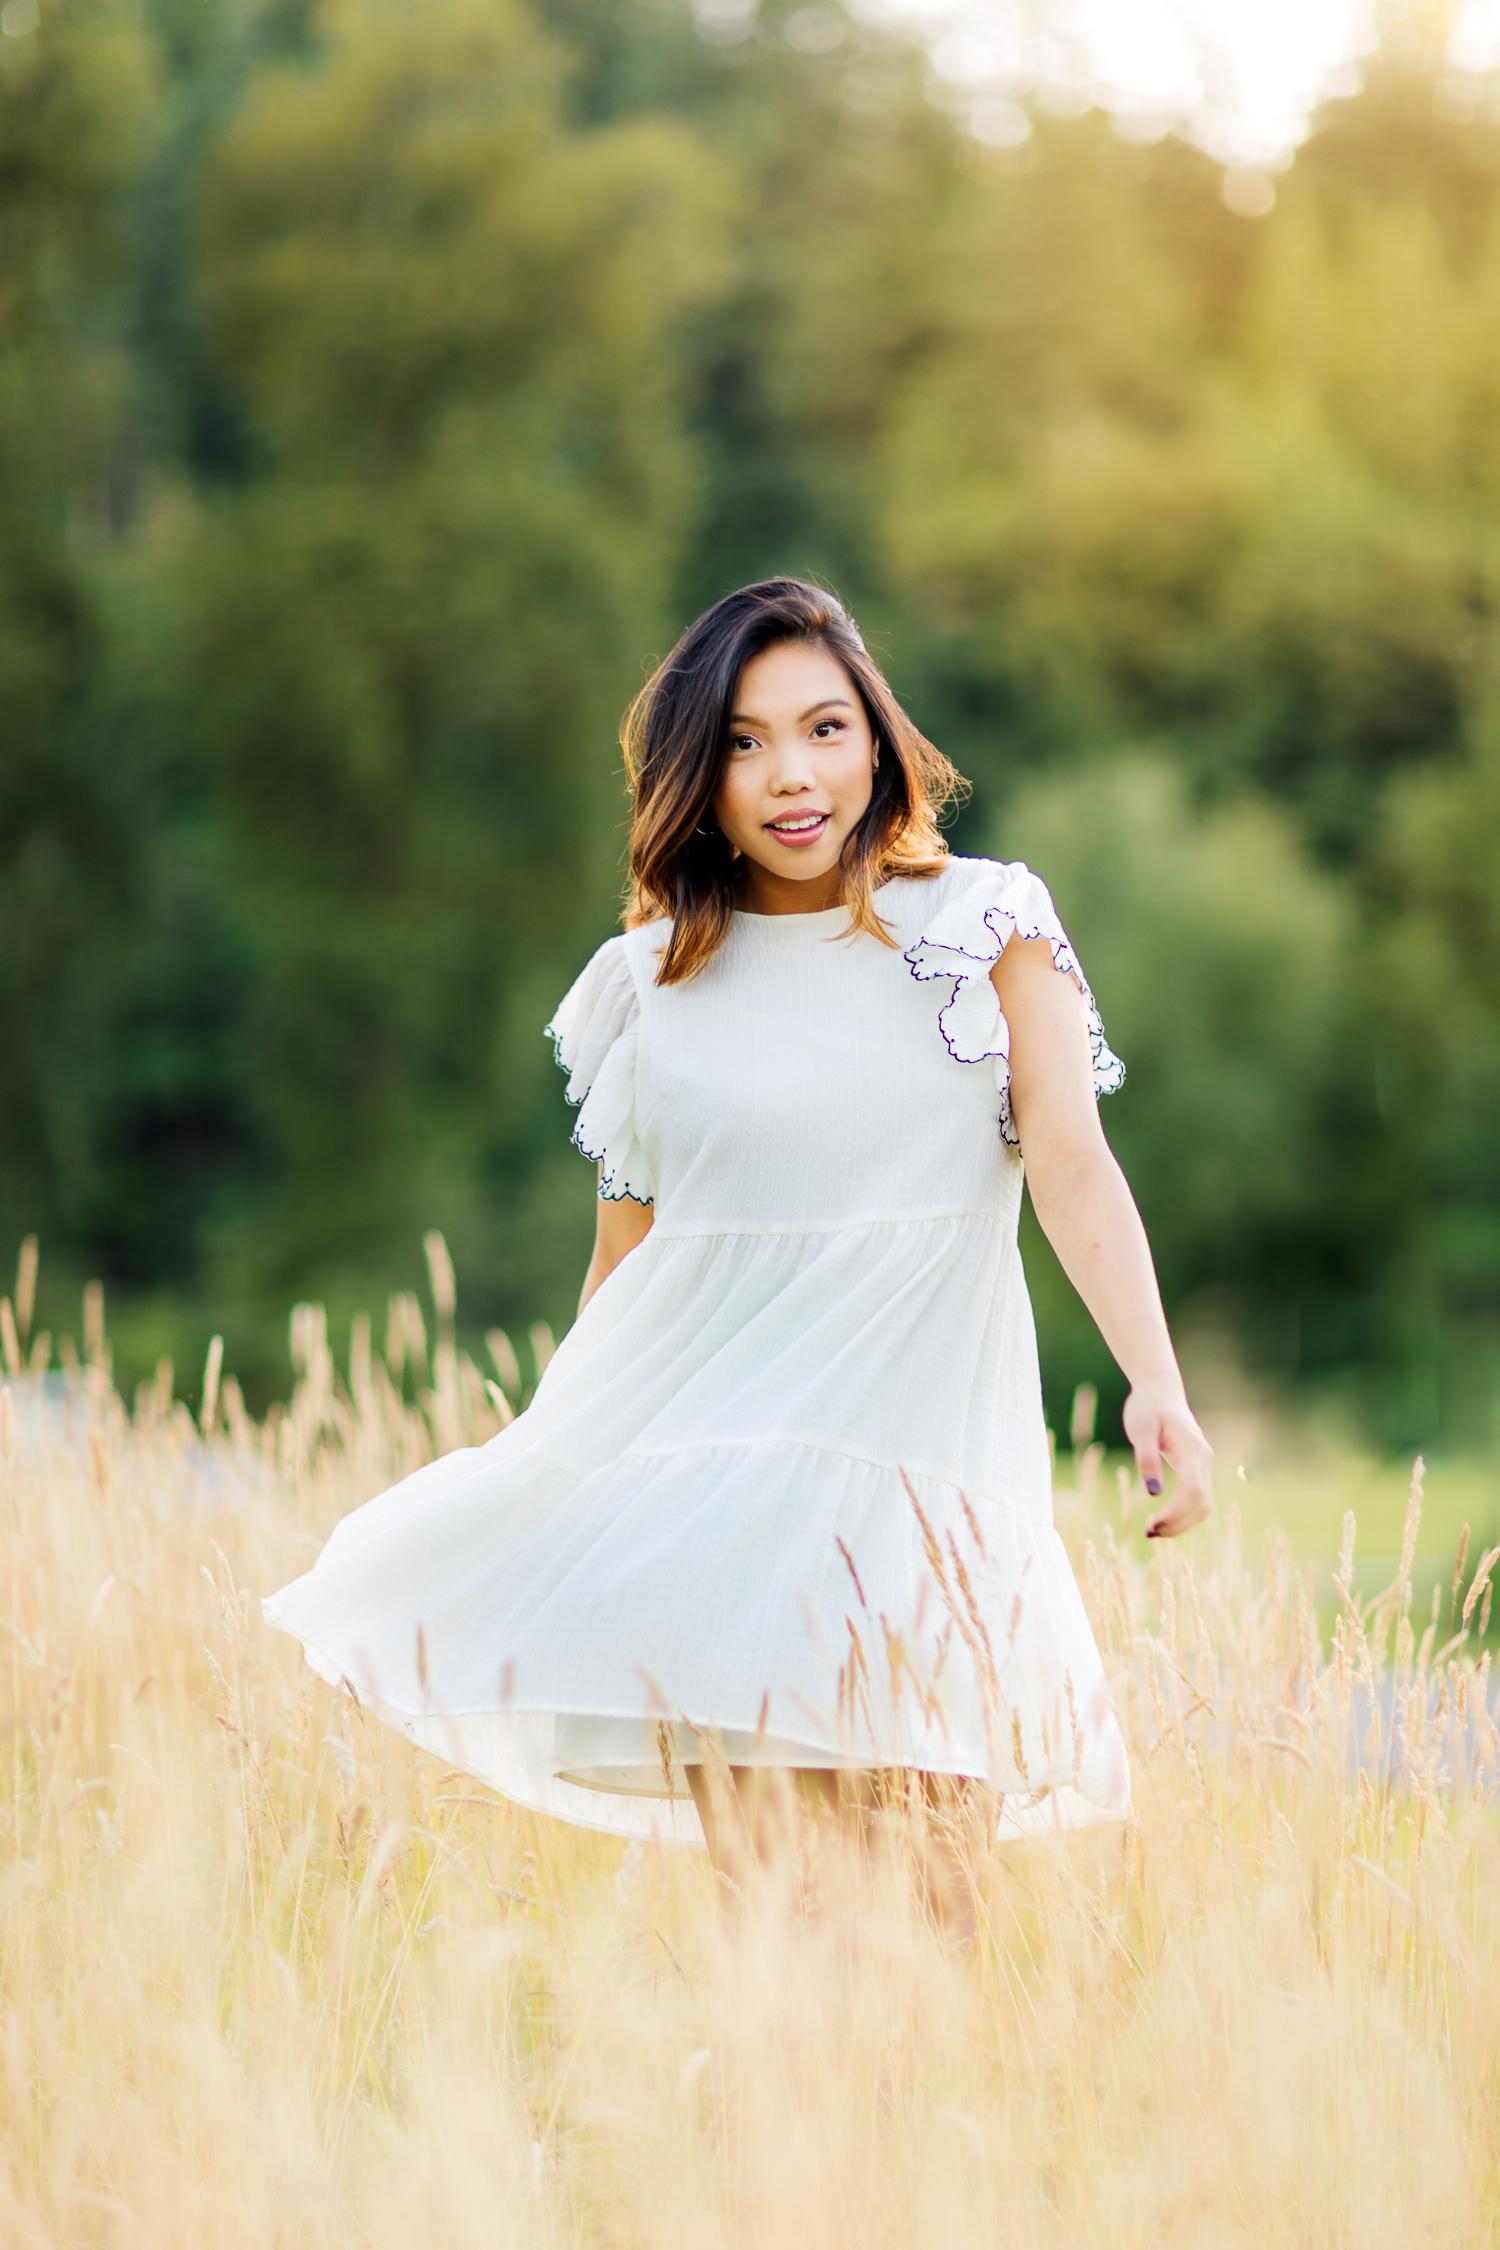 ariellanoellephotography-highschool-senior-portraiture-seattle-area-monroe-duvall-washington-state-redmond-kirkland-bellevue-snohomish-portraiture-graduation-images-2-4.jpg